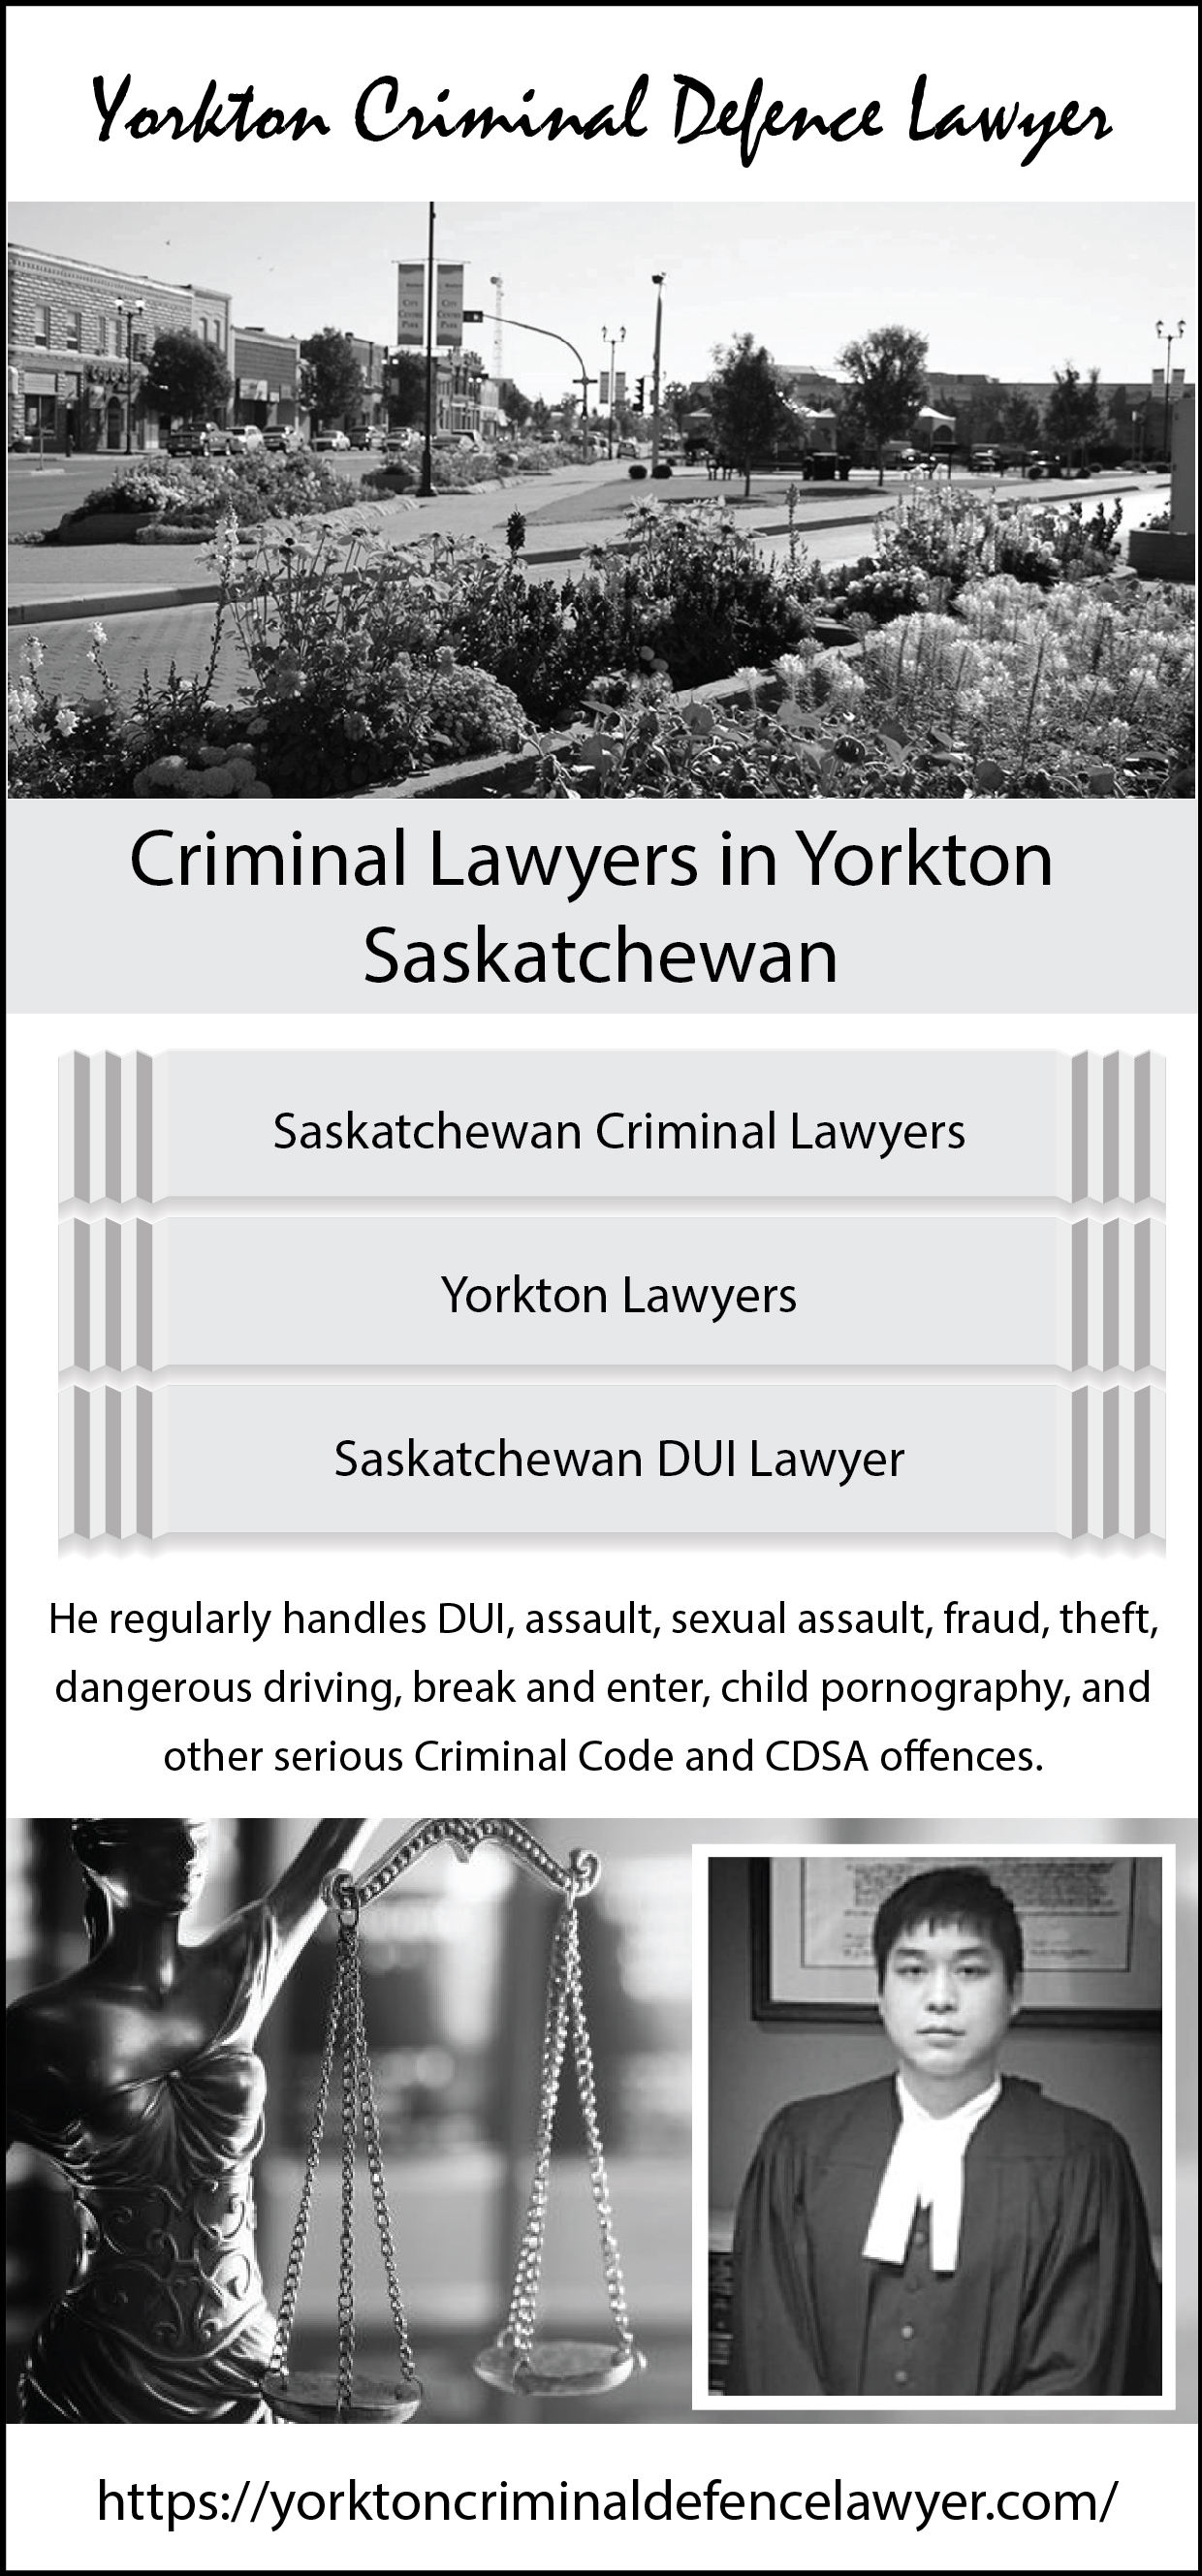 Saskatchewan Criminal Lawyers